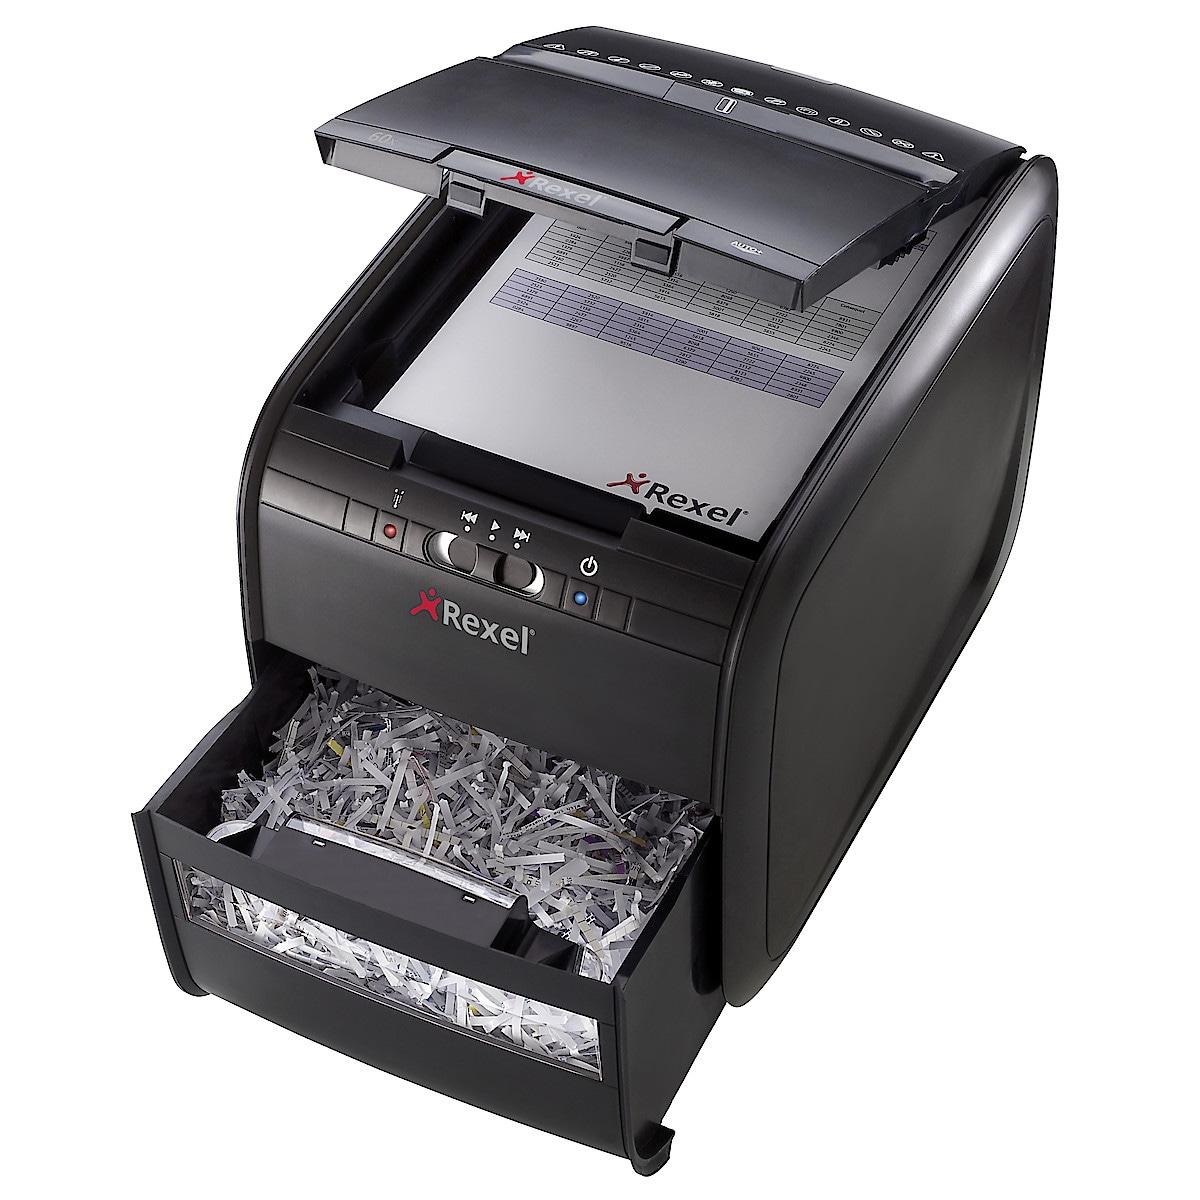 Rexel Auto+ 60 Cross-Cut Paper Shredder